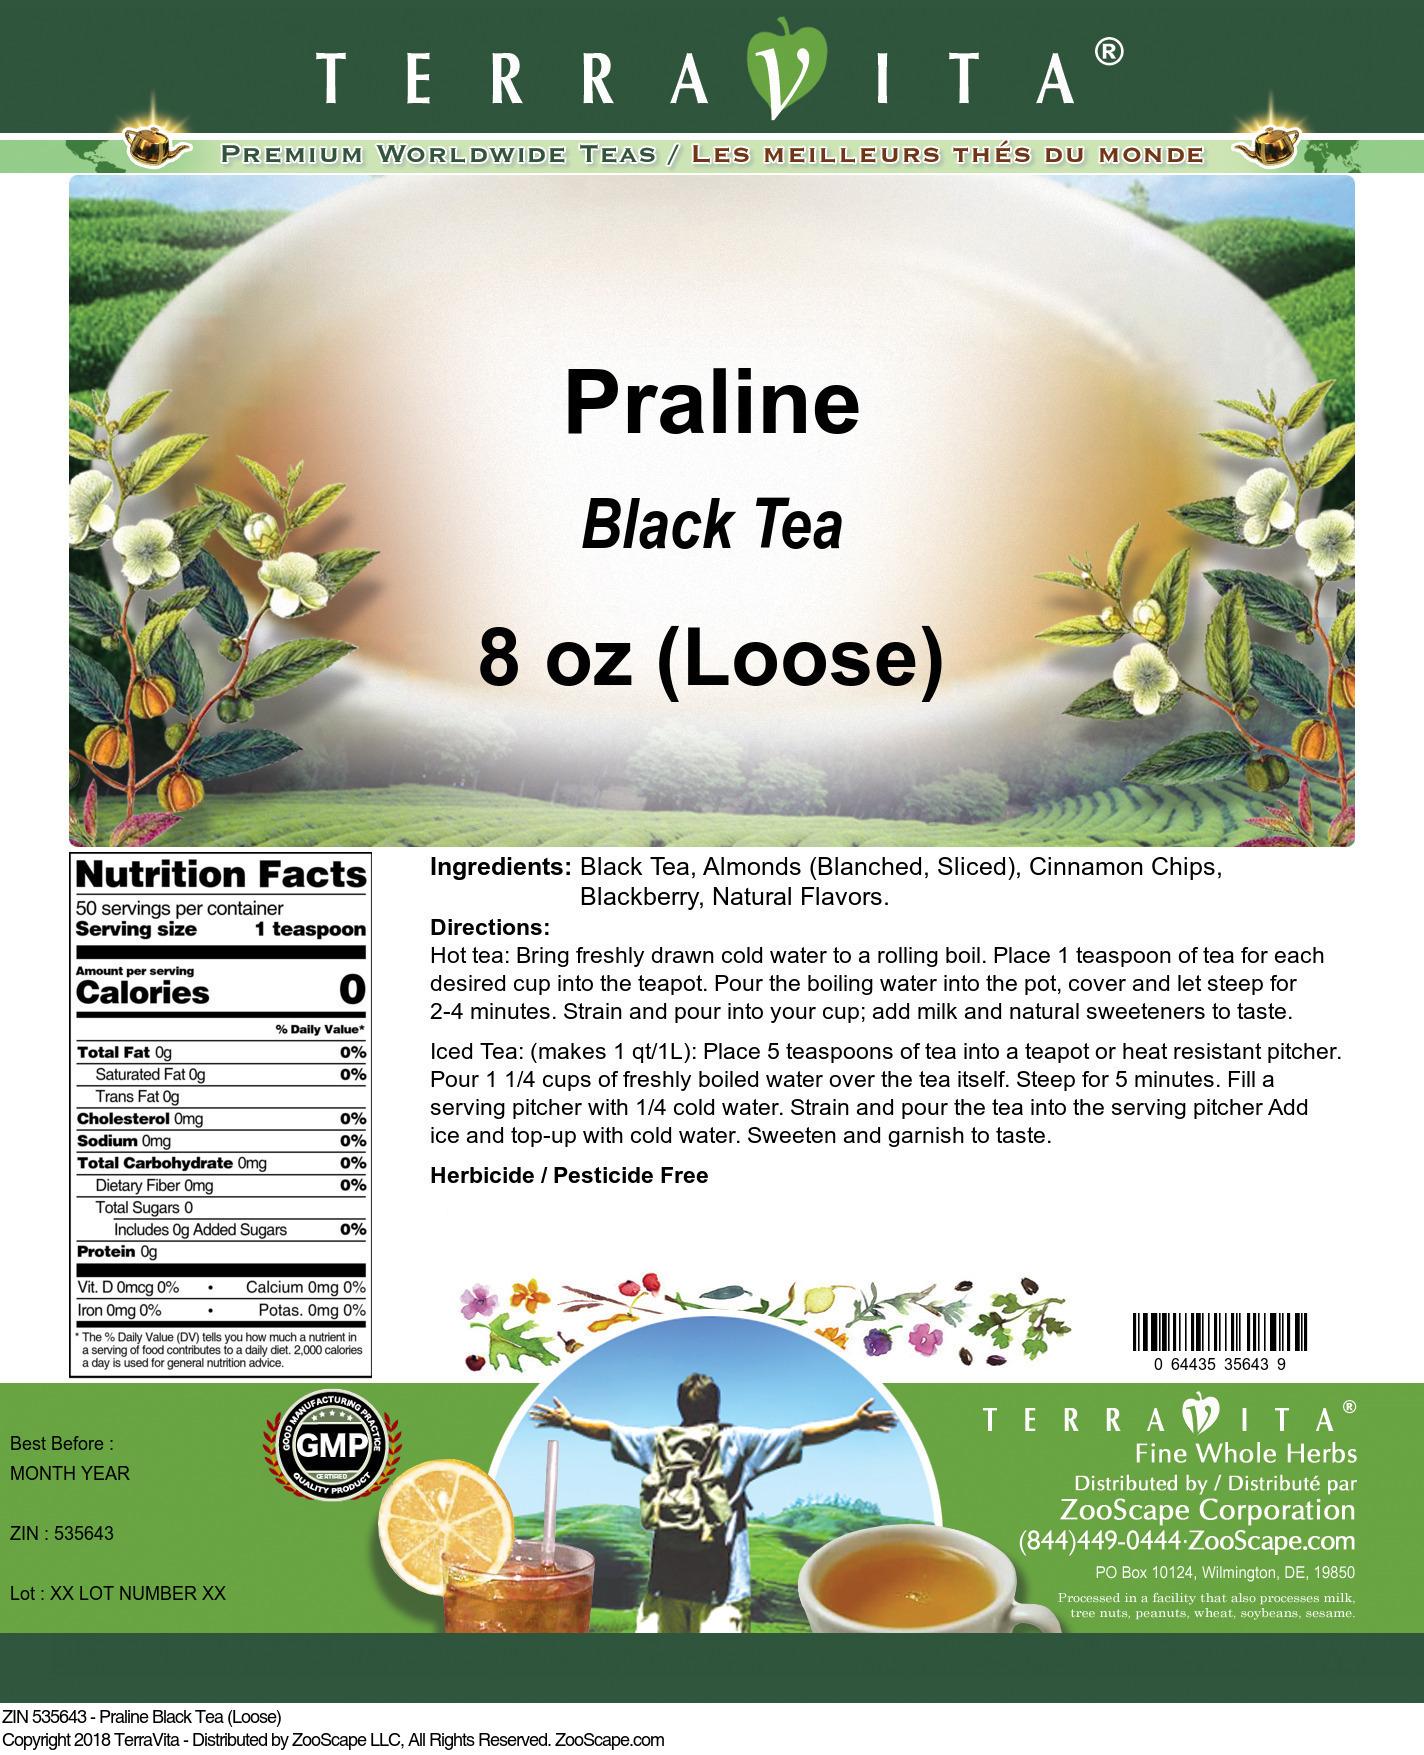 Praline Black Tea (Loose)